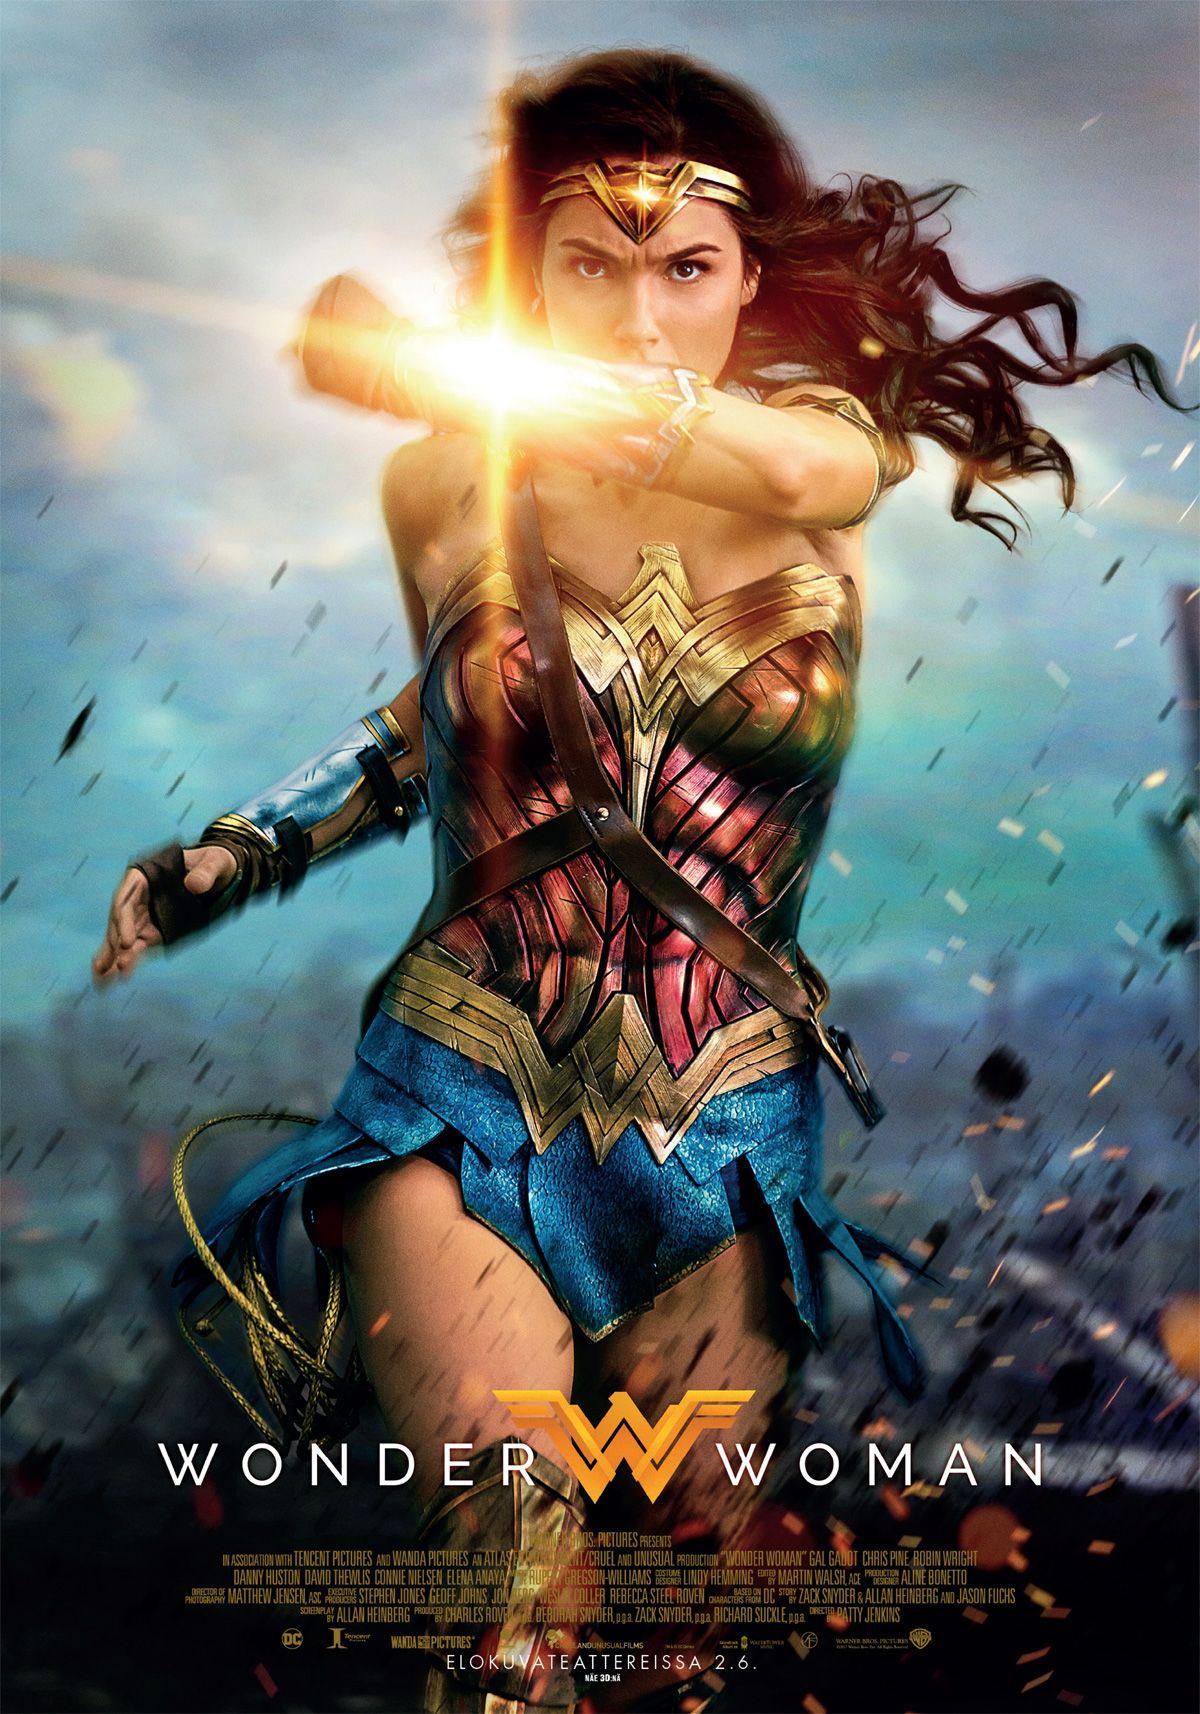 Wonder Woman Poster Collection 50 Printable Posters Free Download Wonder Woman Movie Woman Movie Gal Gadot Wonder Woman